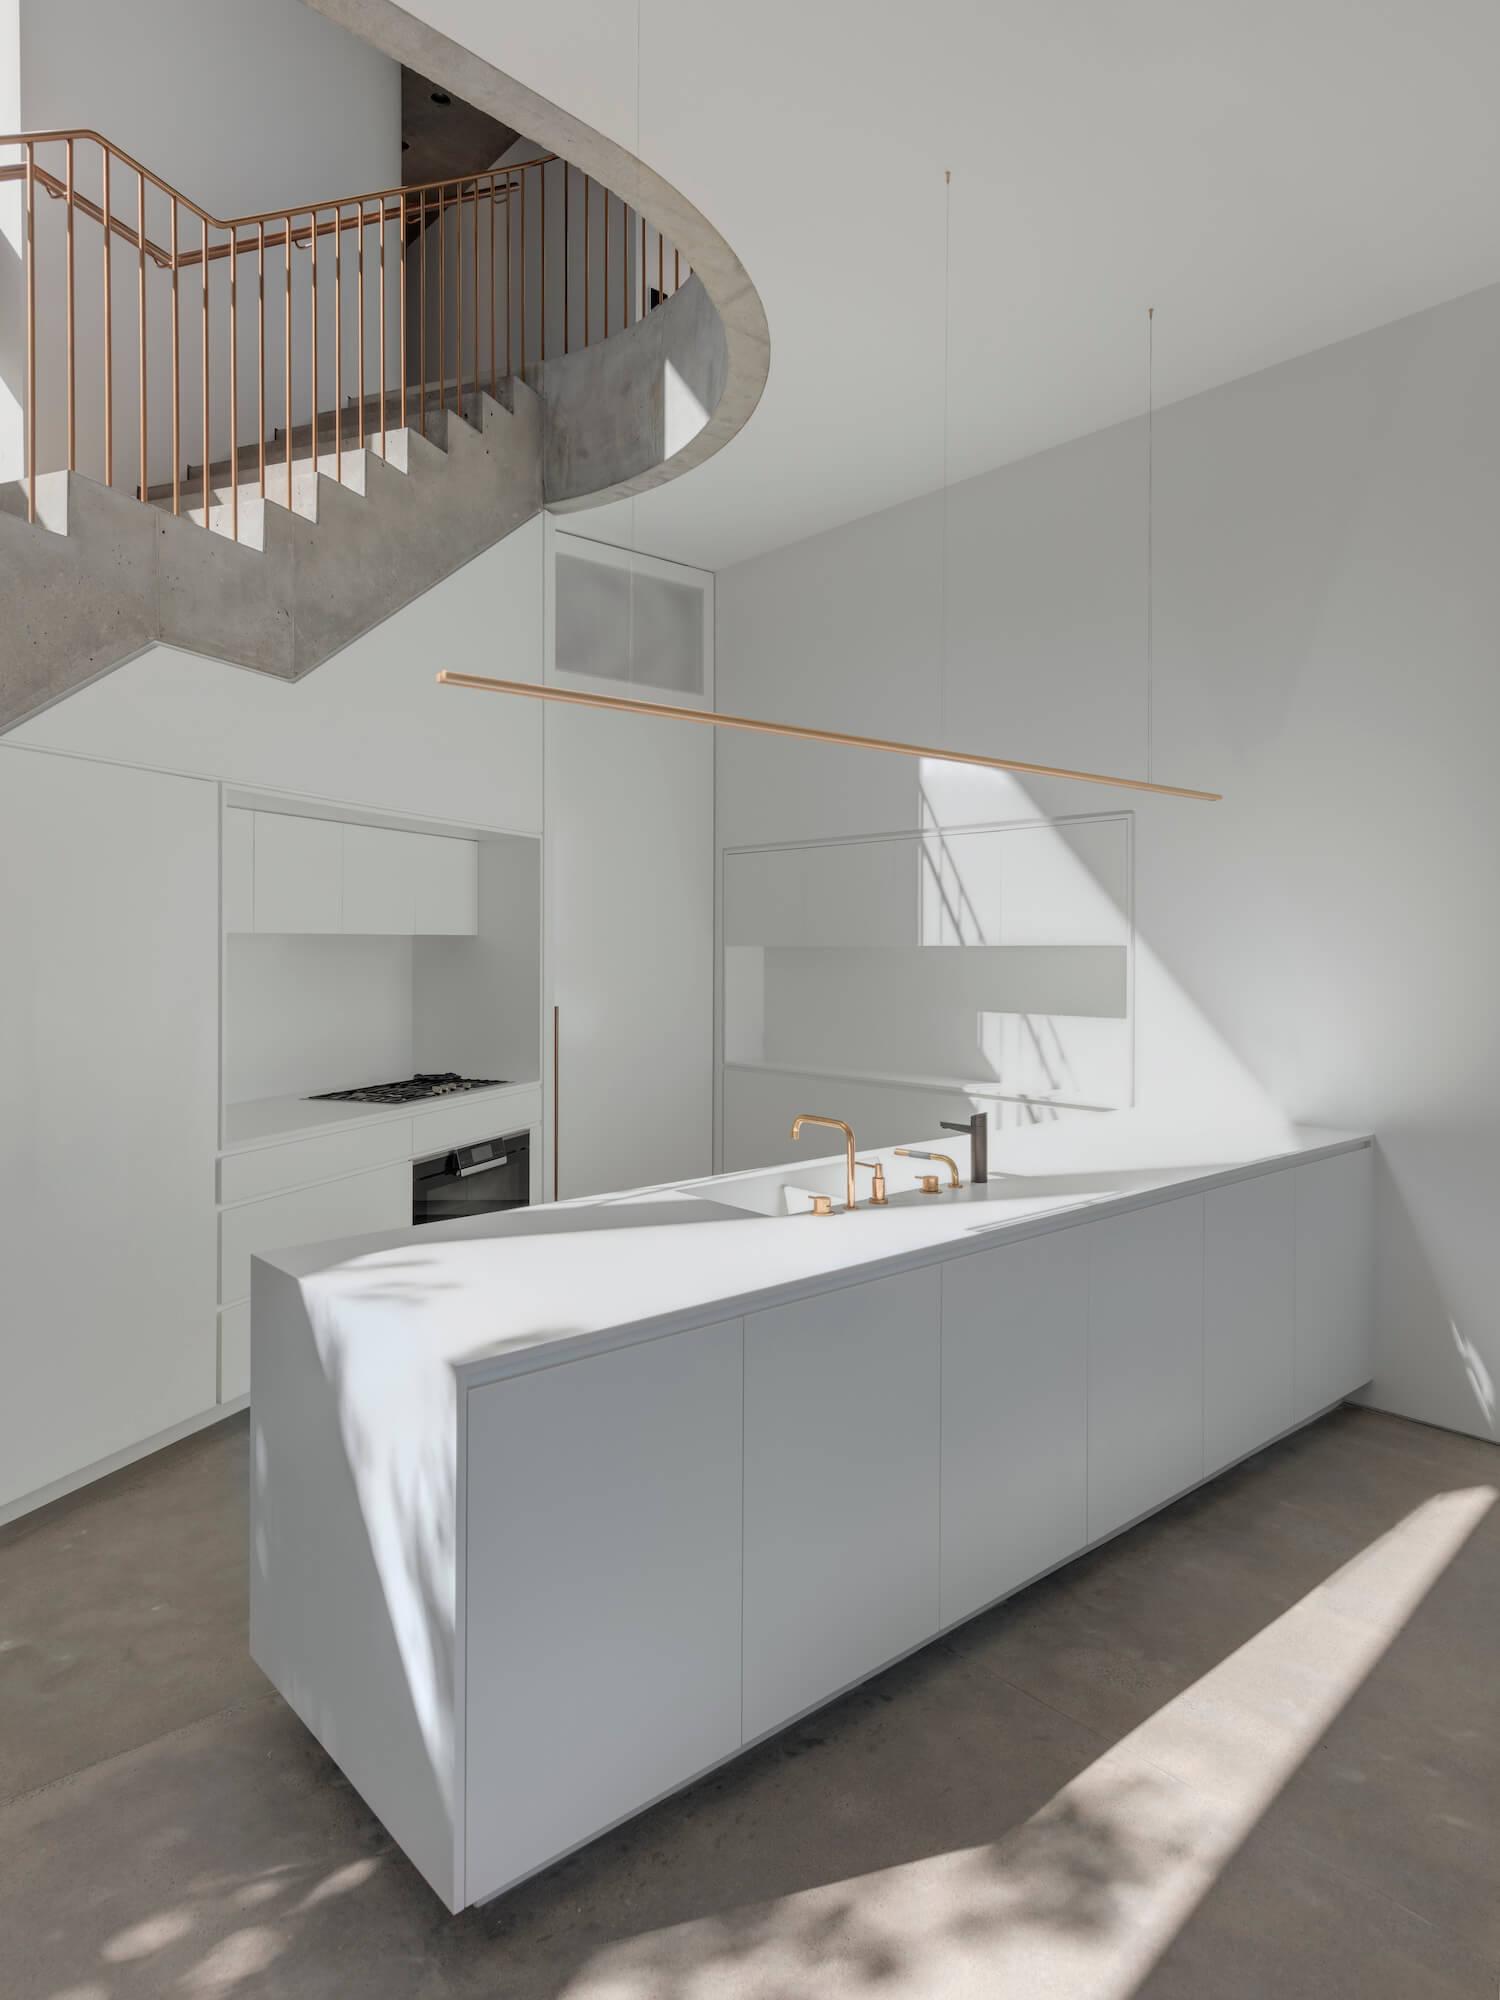 est living Woodward Architecture Project Crescent House 1